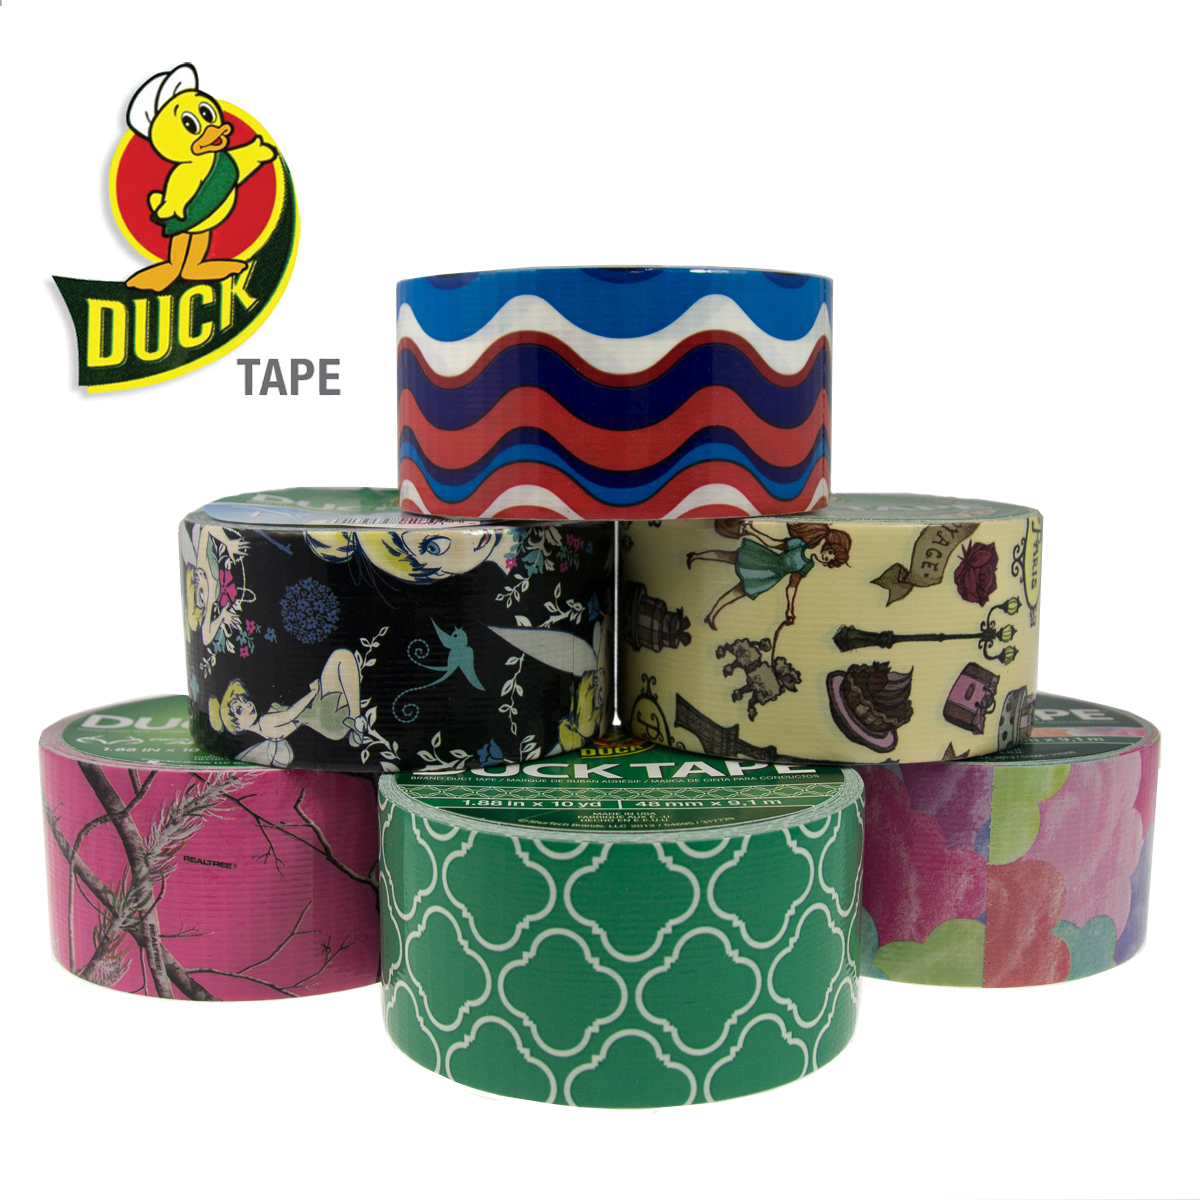 Duck brand duct tape rolls